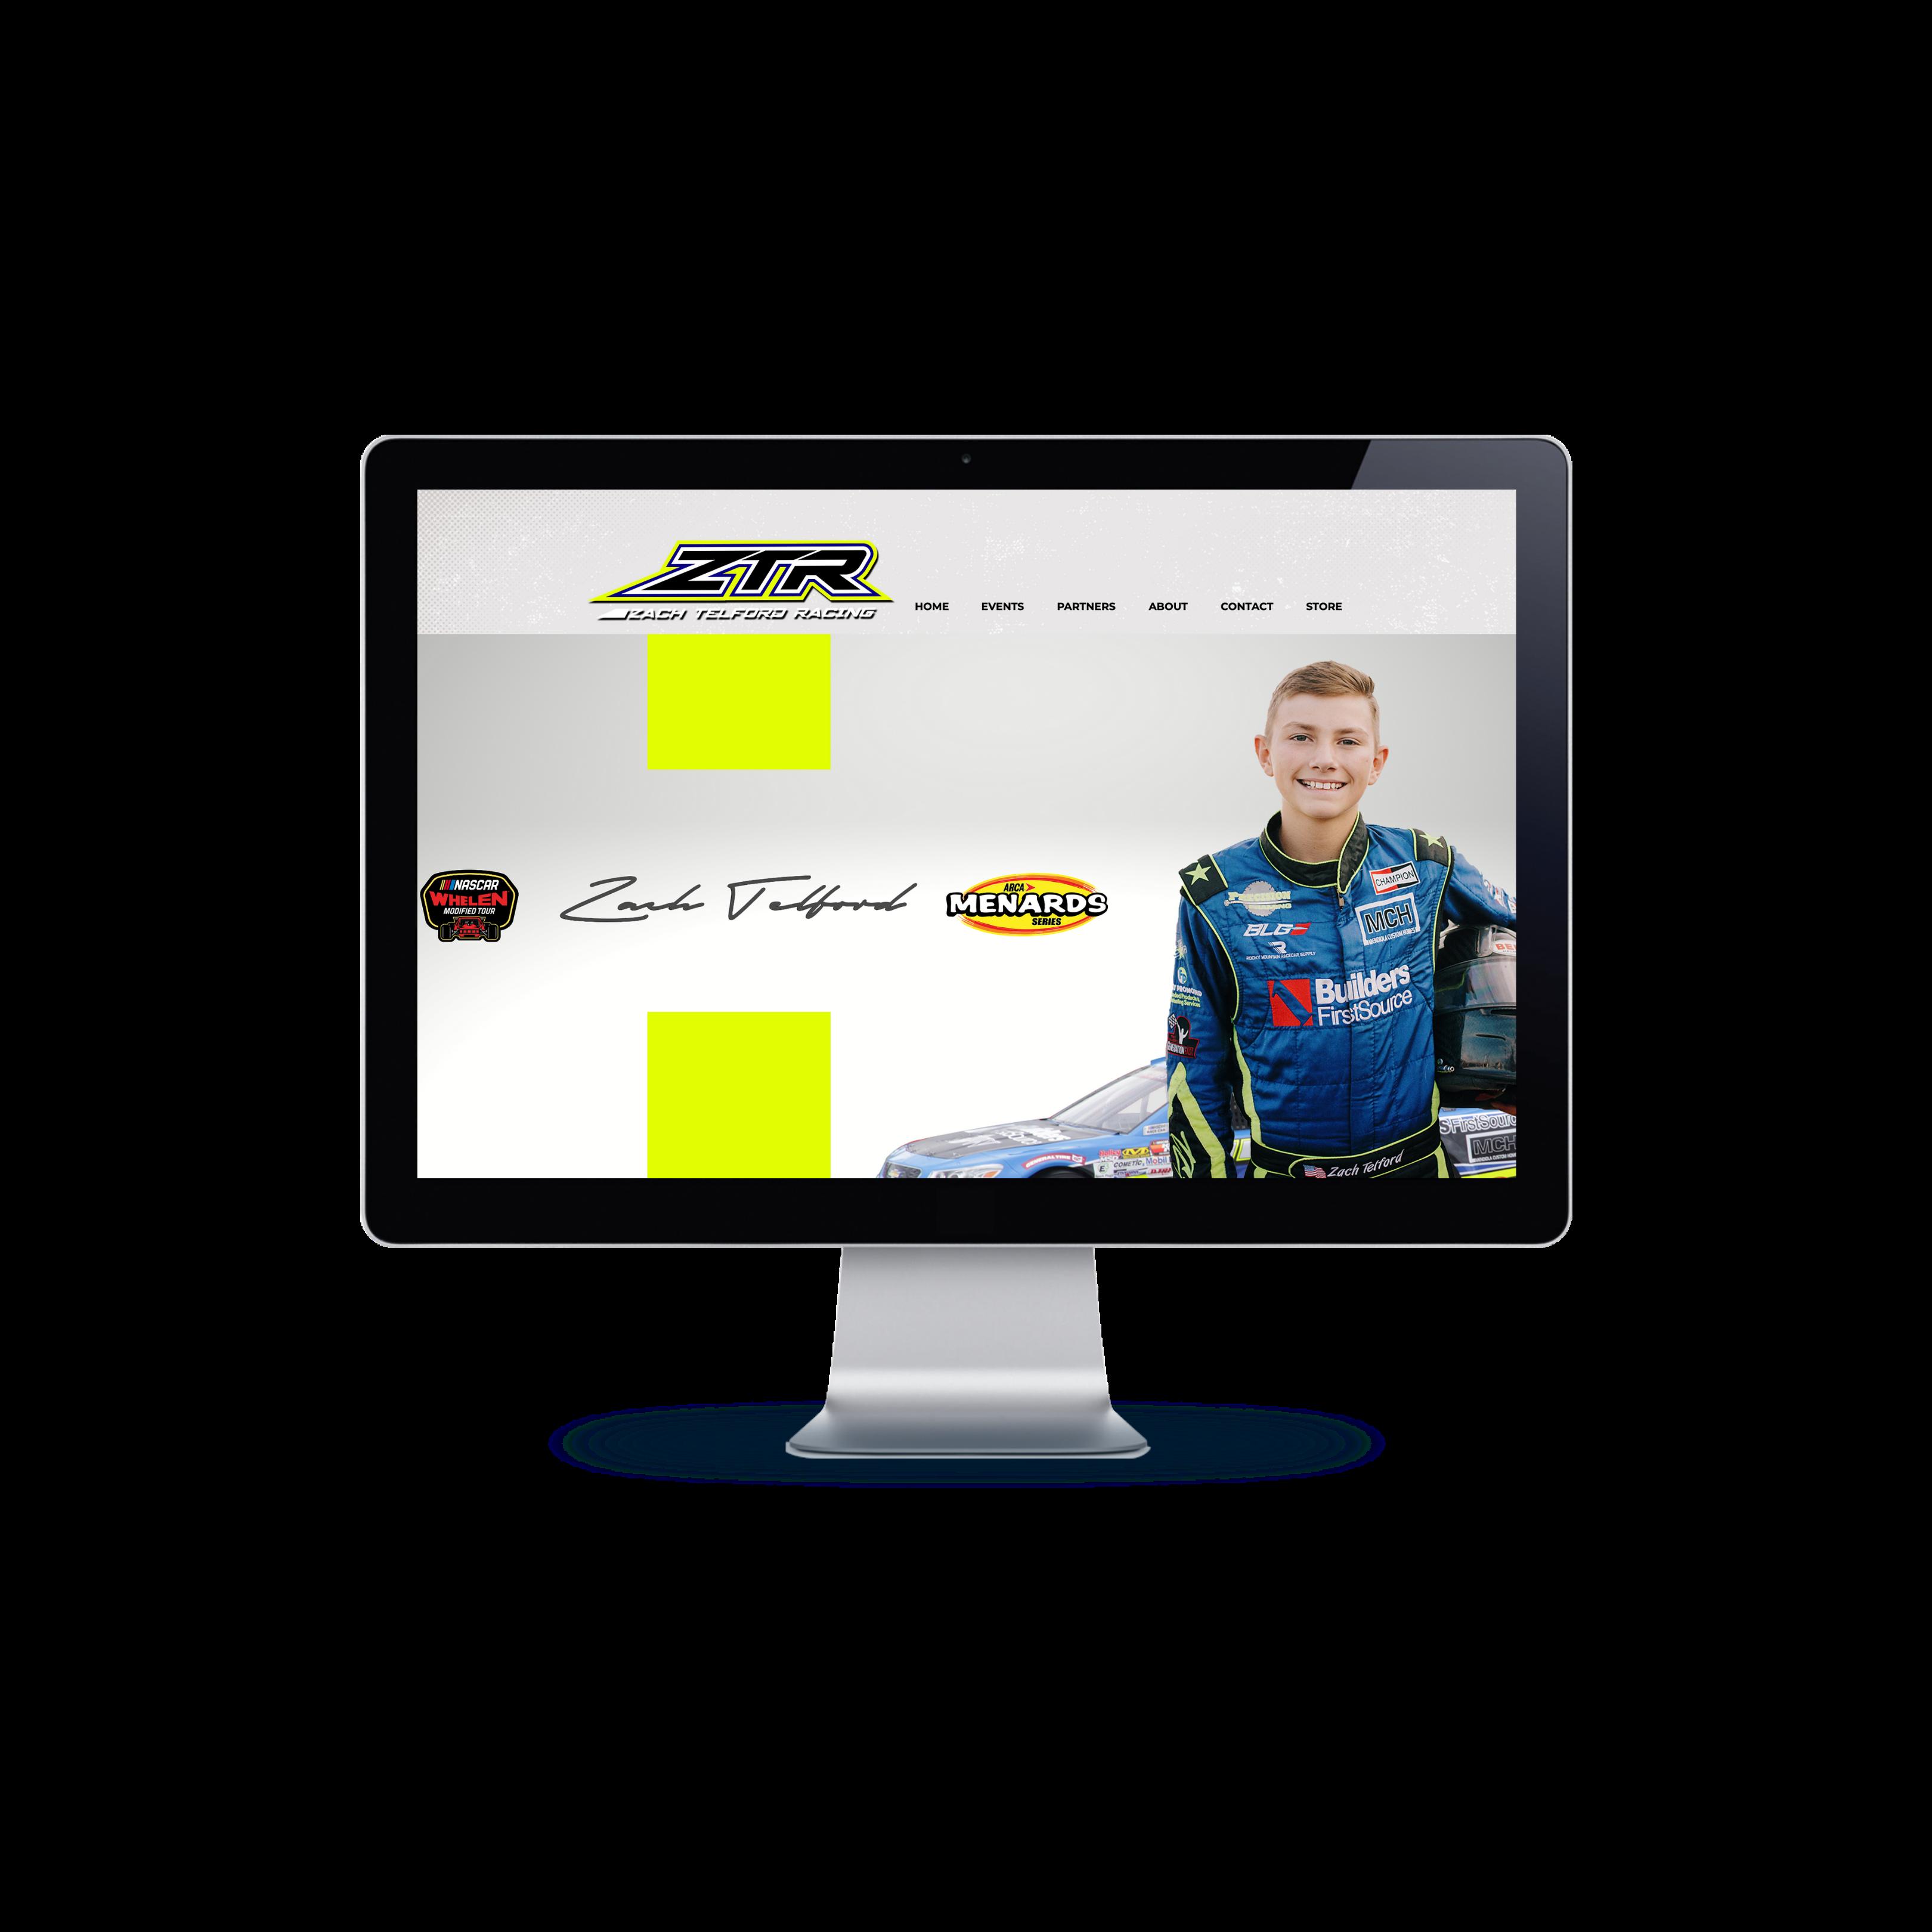 Zach Telford Racing